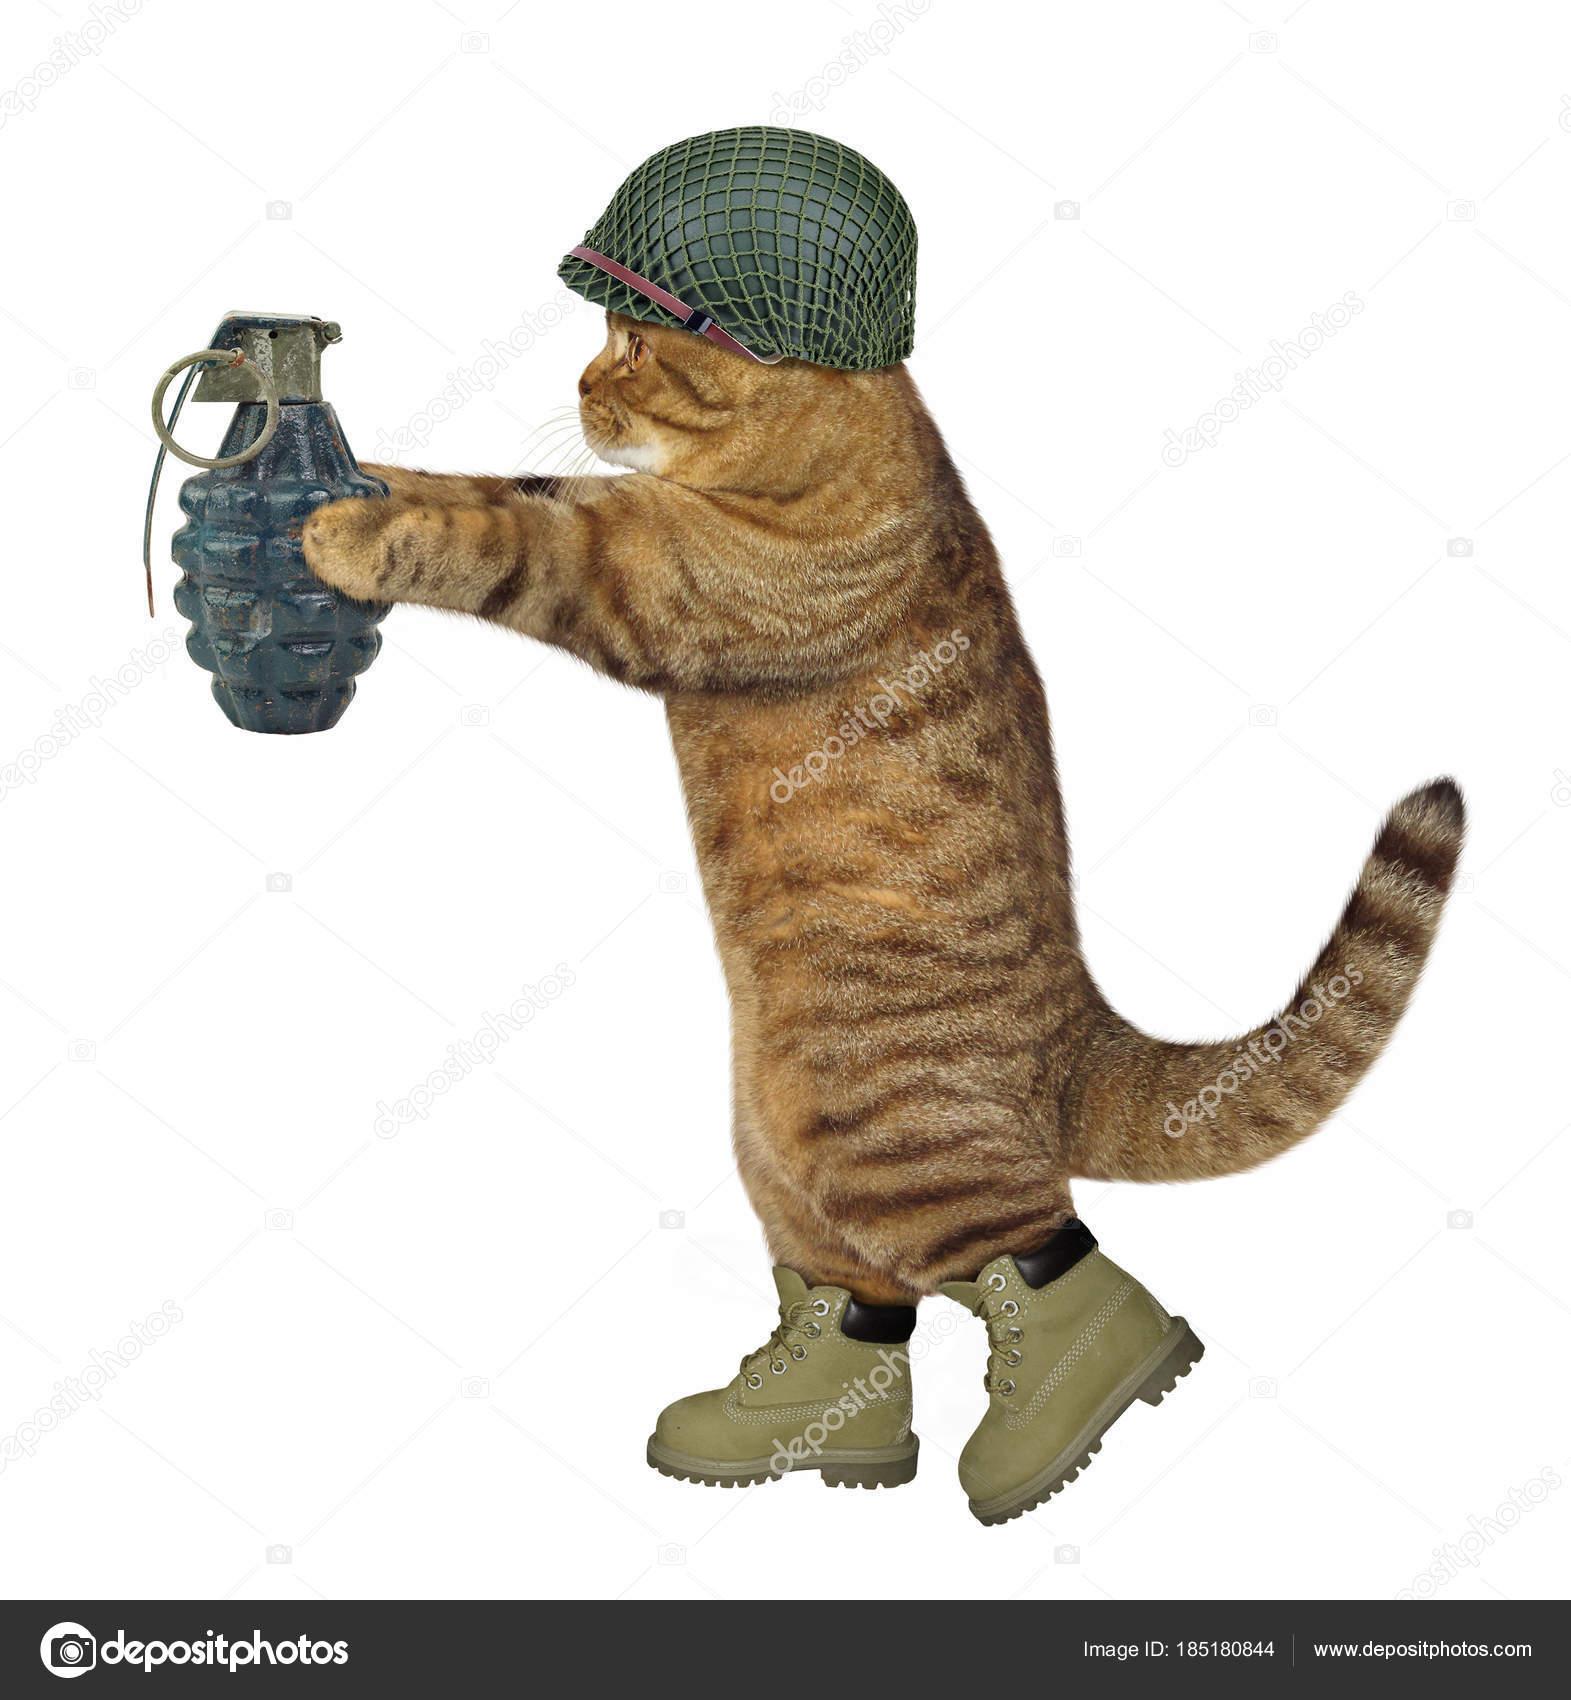 https://st3.depositphotos.com/7863750/18518/i/1600/depositphotos_185180844-stock-photo-cat-soldier-with-grenade-2.jpg